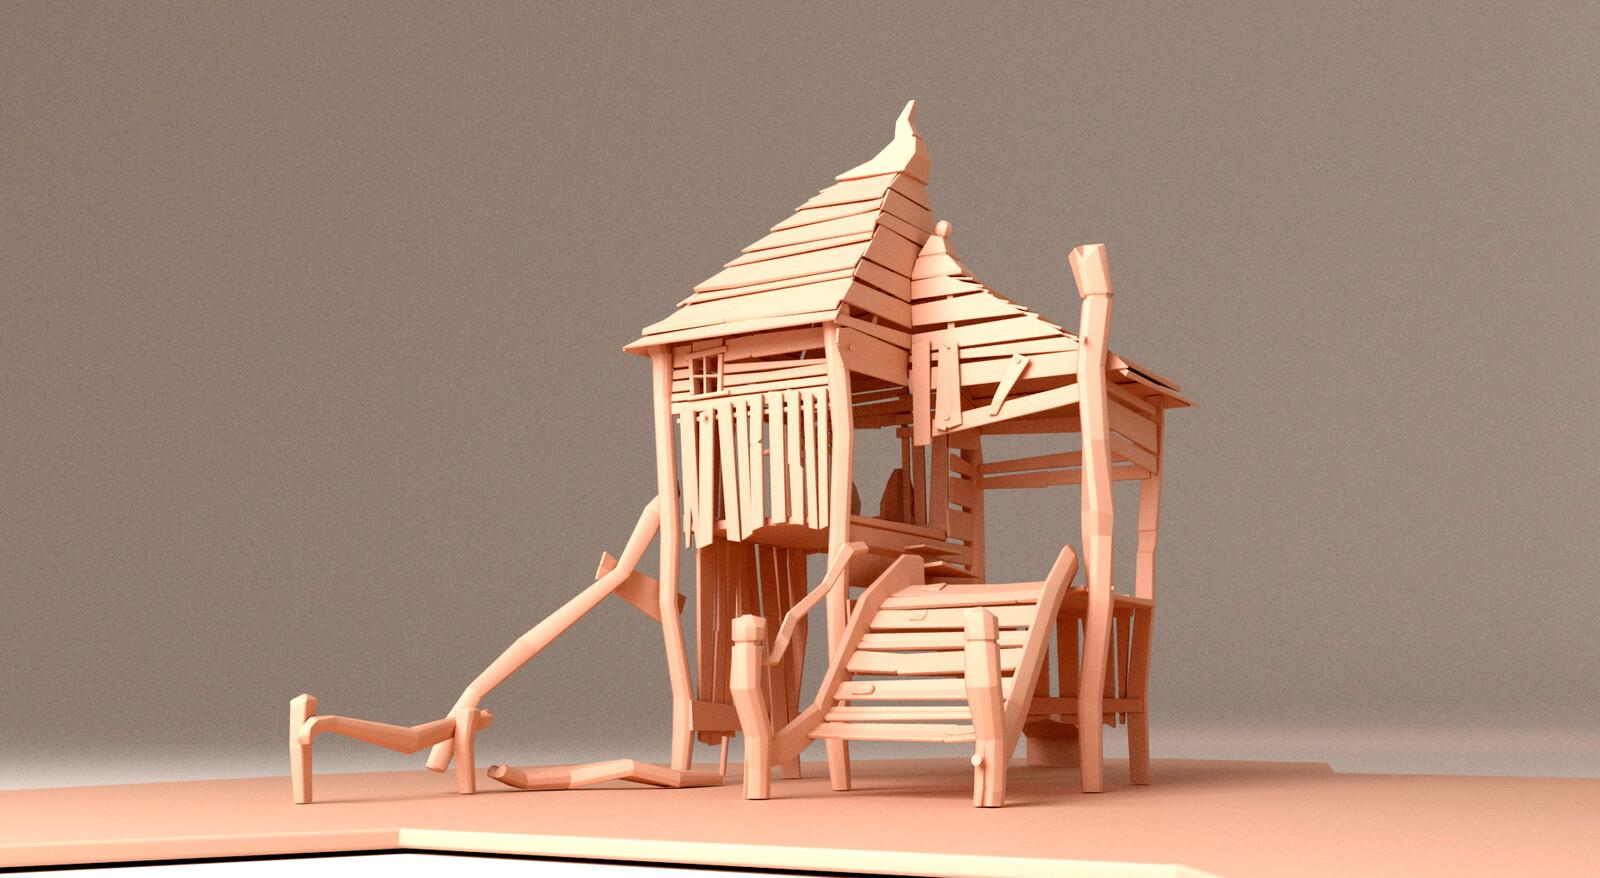 3D model, close-up, main building, front view